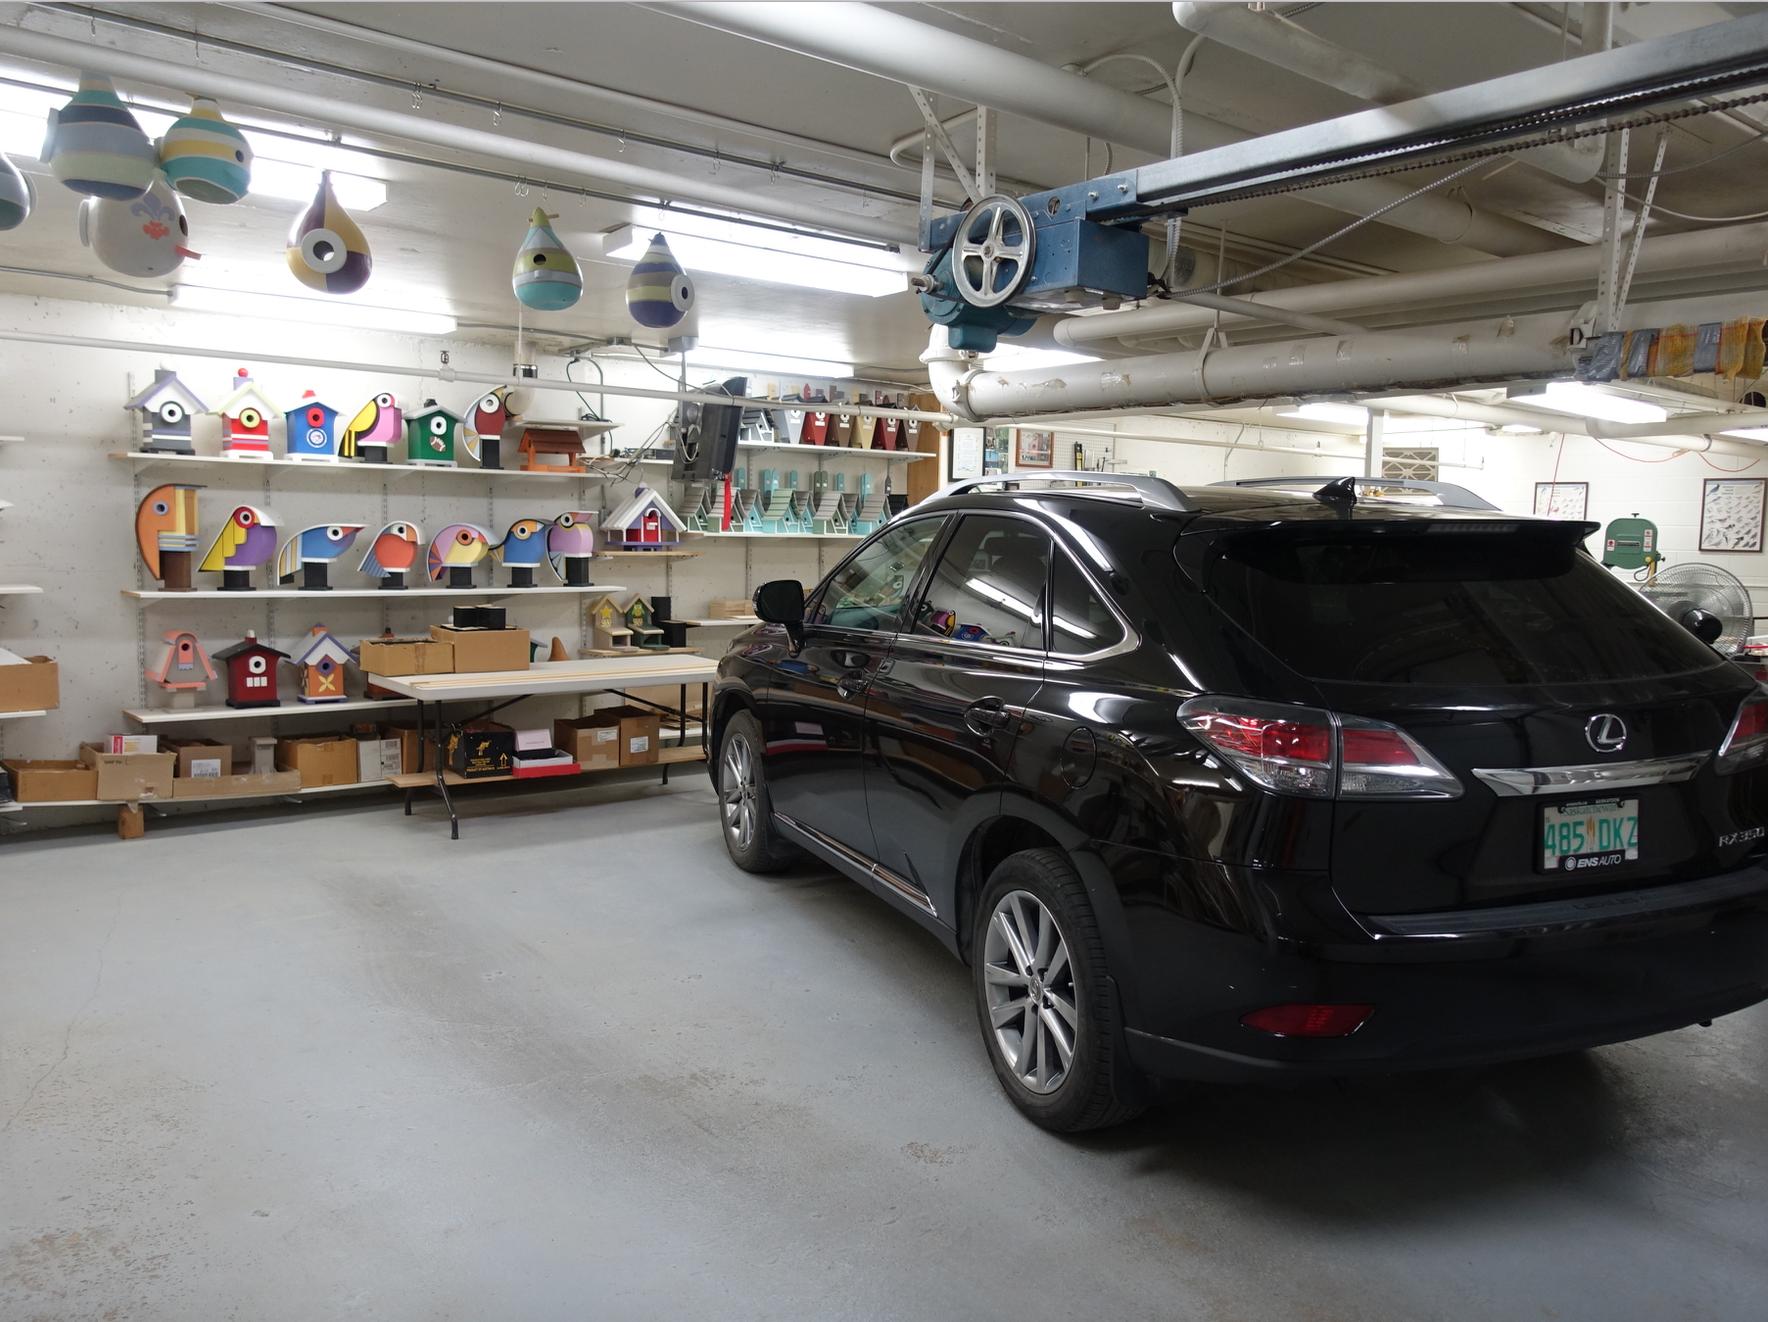 John Remai's (JR to his friends) garage/workshop.